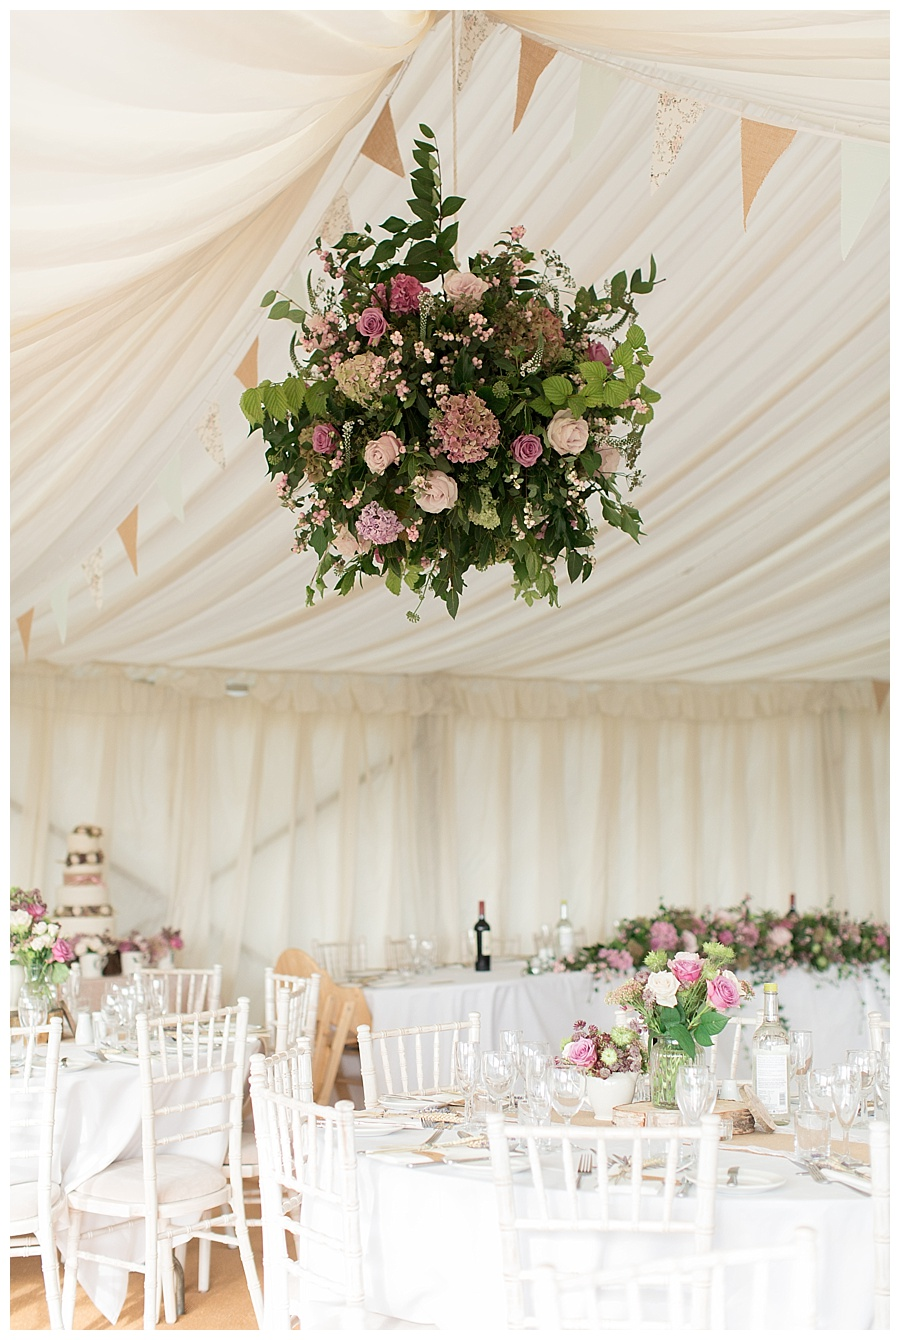 Wedding Photography Highlights 2016 | Blog | Hayley Morris Photography